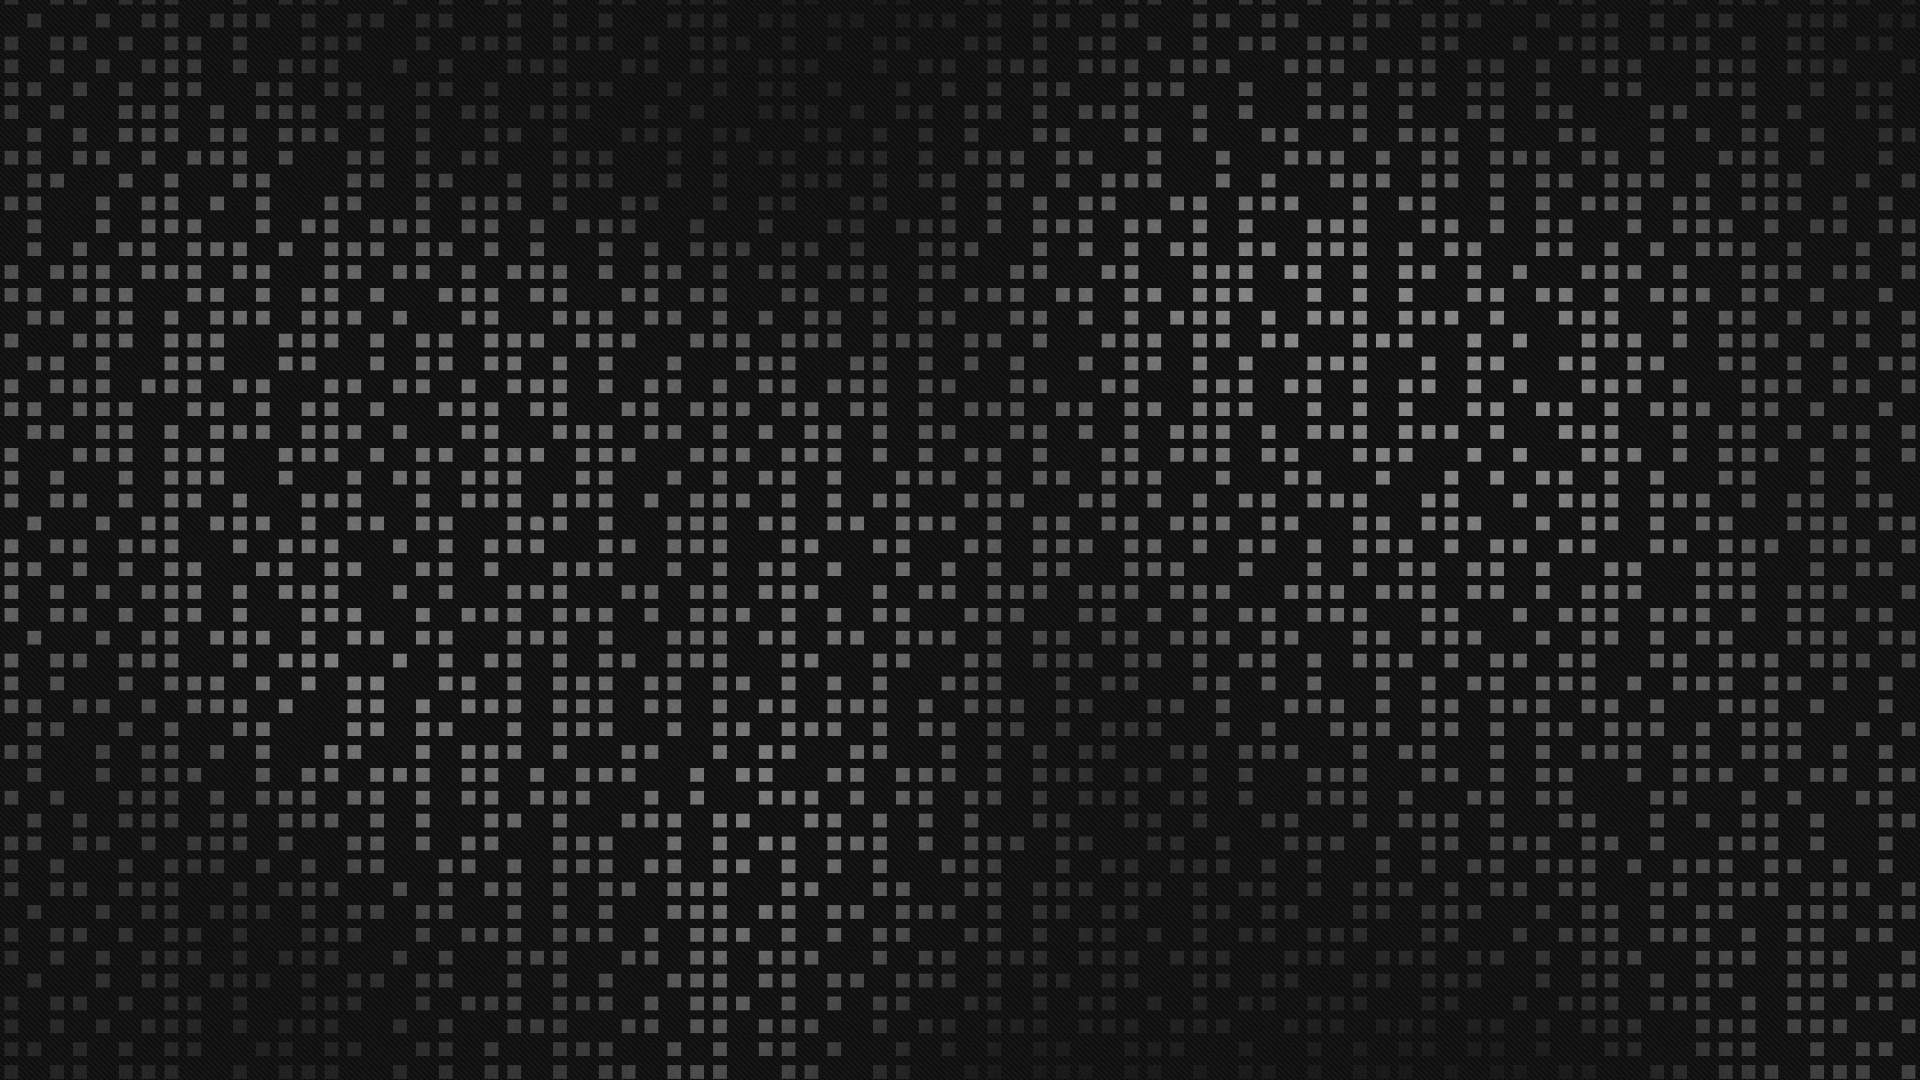 Black Texture Wallpaper ·① Download Free Cool High